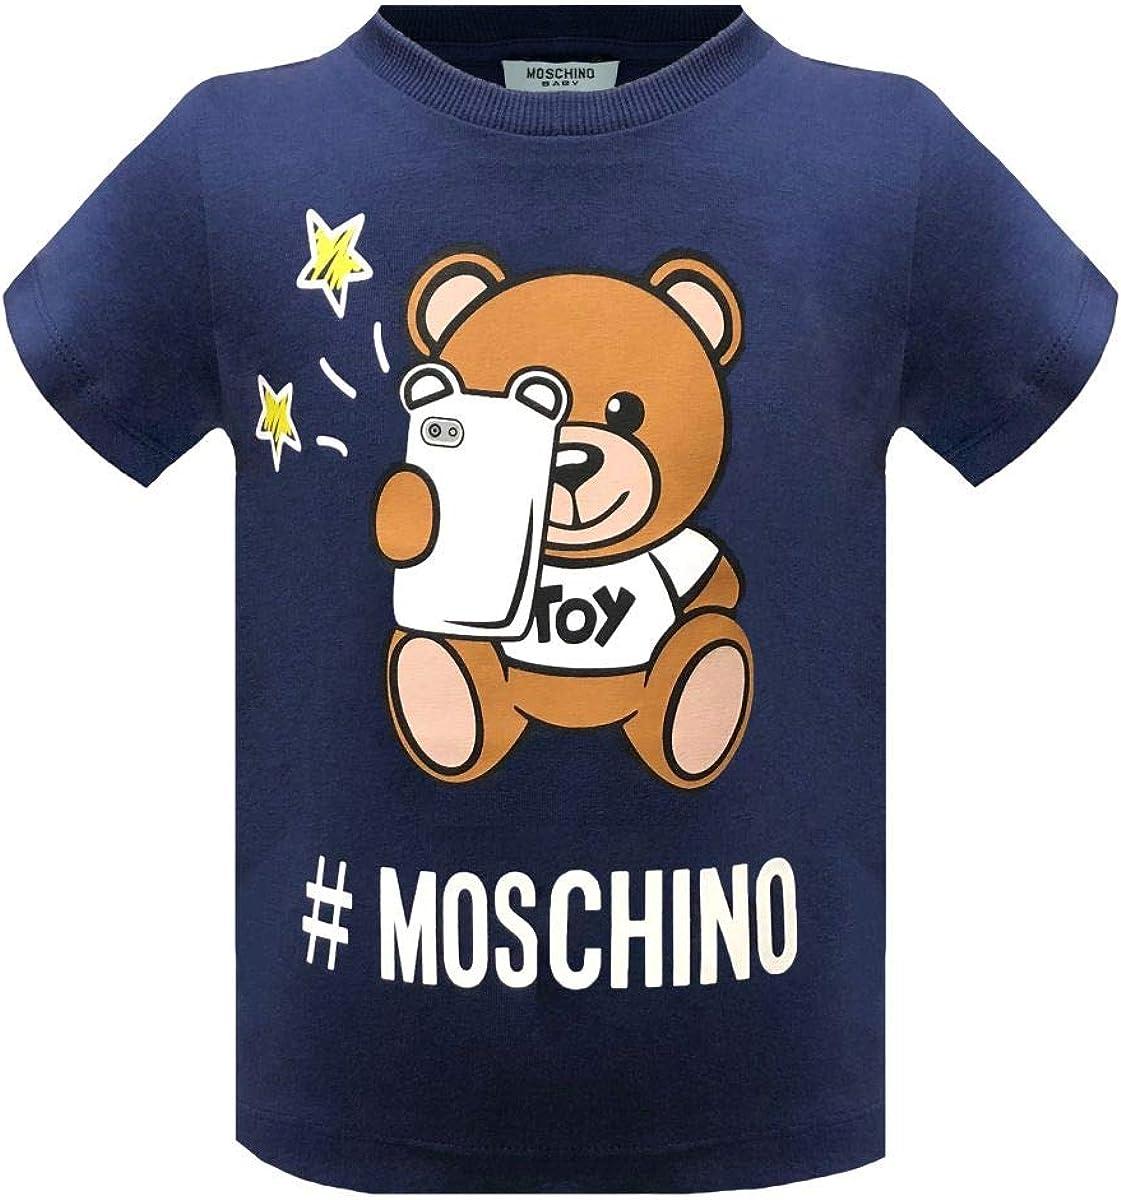 Moschino T-Shirt da Bimbo//A in Cotone